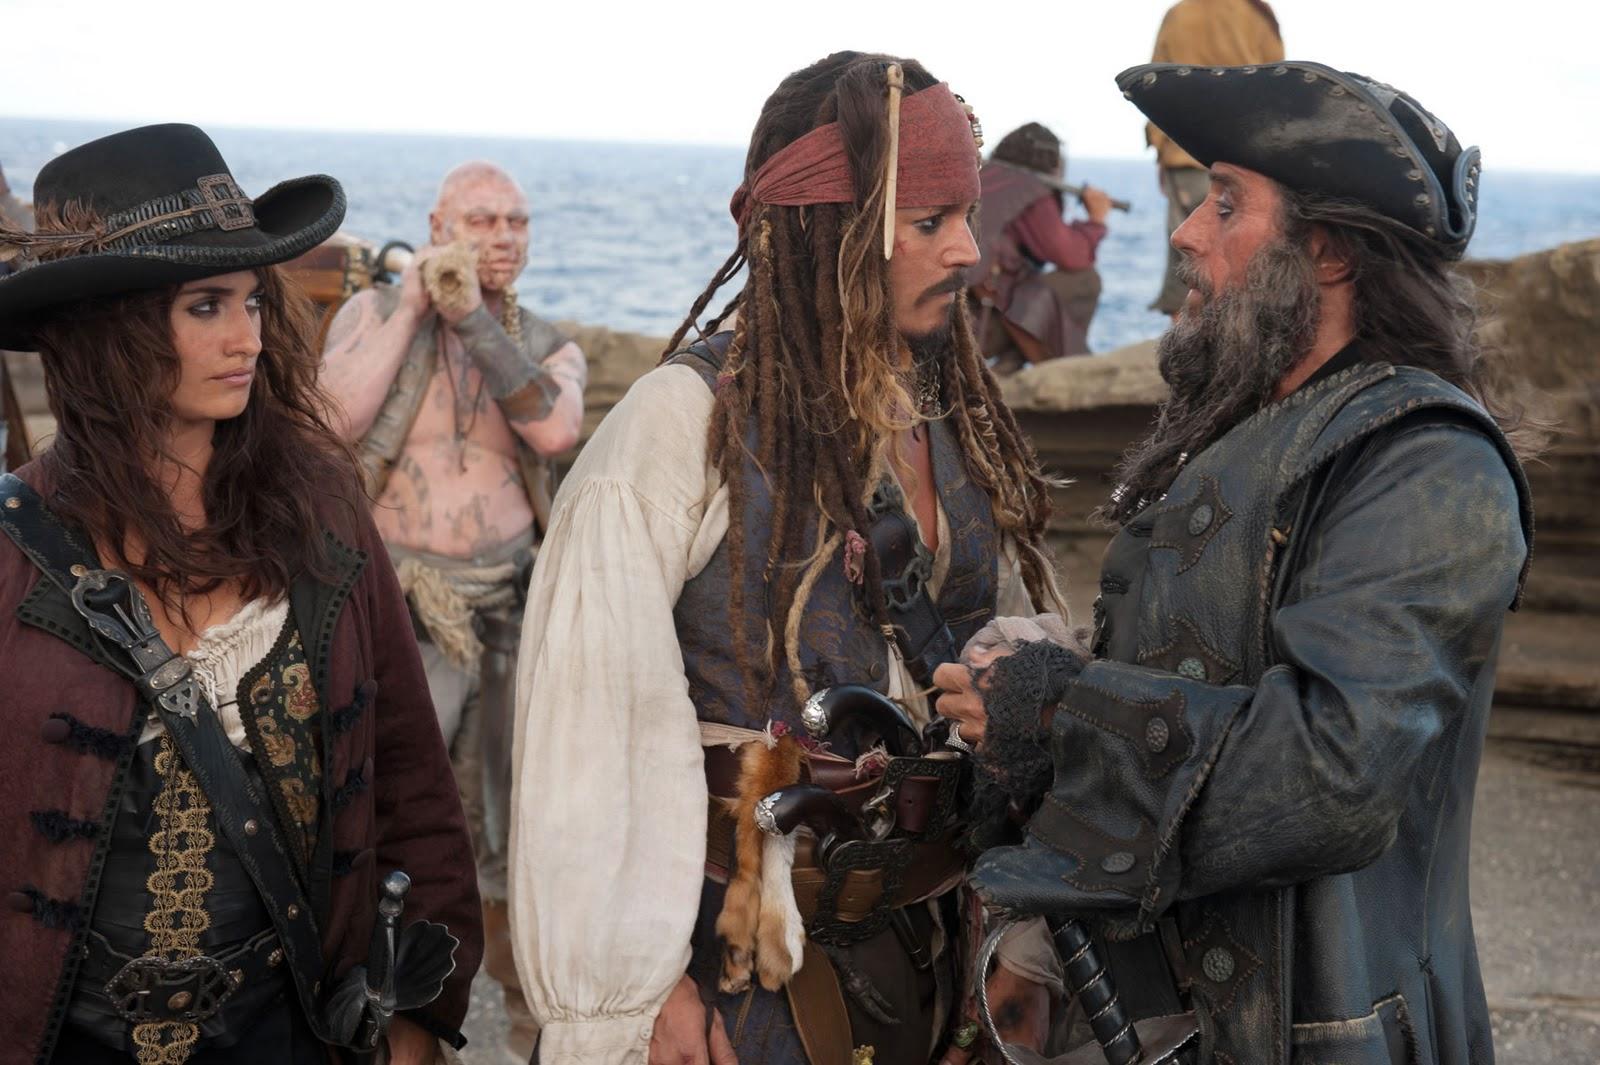 http://1.bp.blogspot.com/_NNW_E9LCtxw/TQGEdRlzenI/AAAAAAAACkI/KNb2sNf0b_g/s1600/Johnny-Depp-Pirates-of-the-Caribbean-On-Stranger-Tides-movie-image-3.jpg